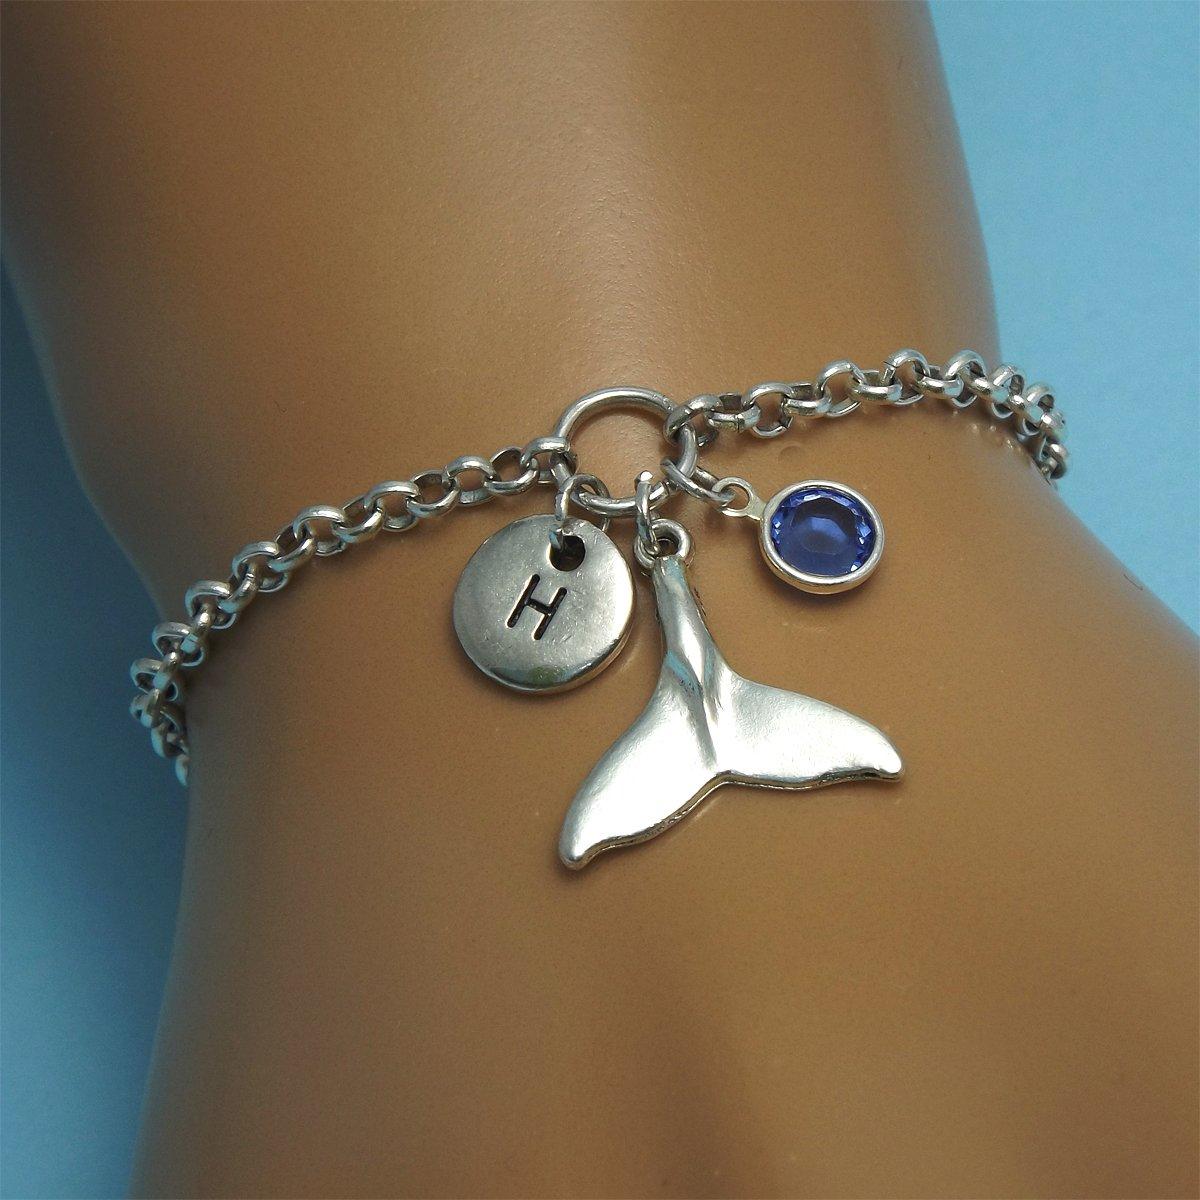 Adjustable NEW silver Whale Tail Bracelet,waterproof,Surfer,Beach,Adjustable gif